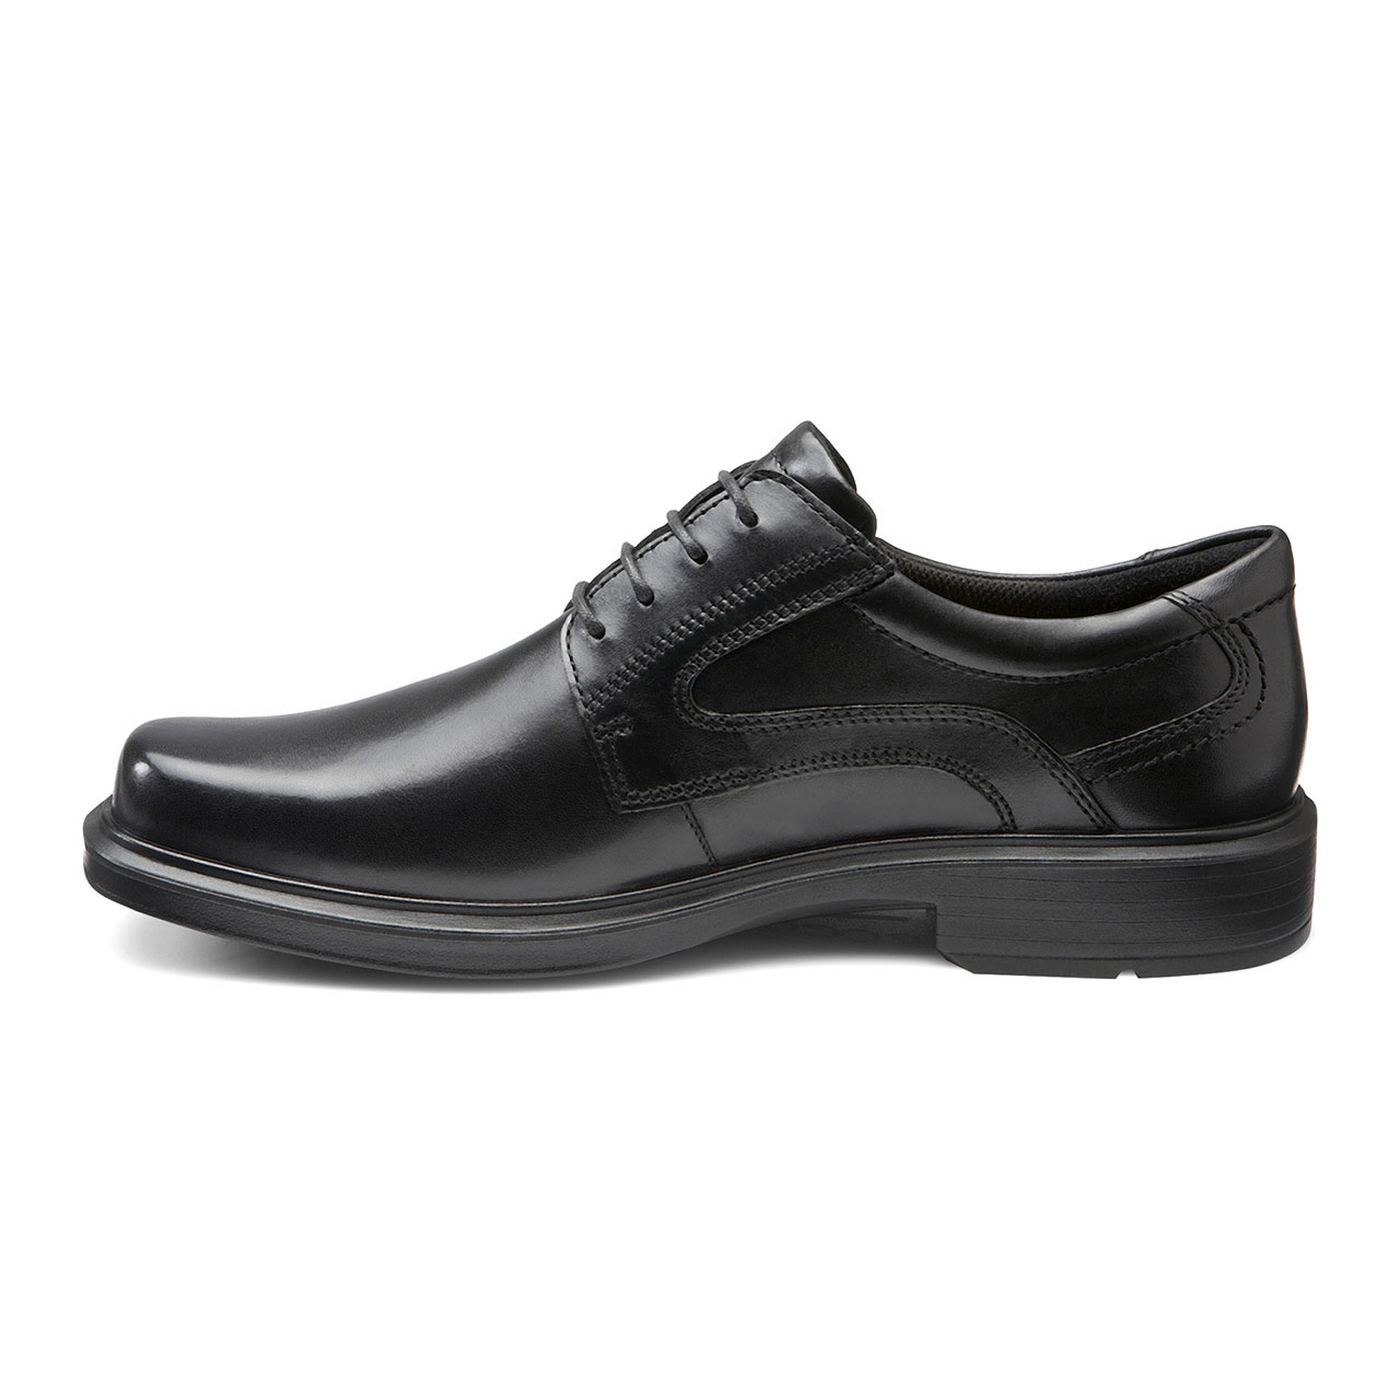 6d01489939df ECCO Helsinki Men s Plain Toe Tie Shoes